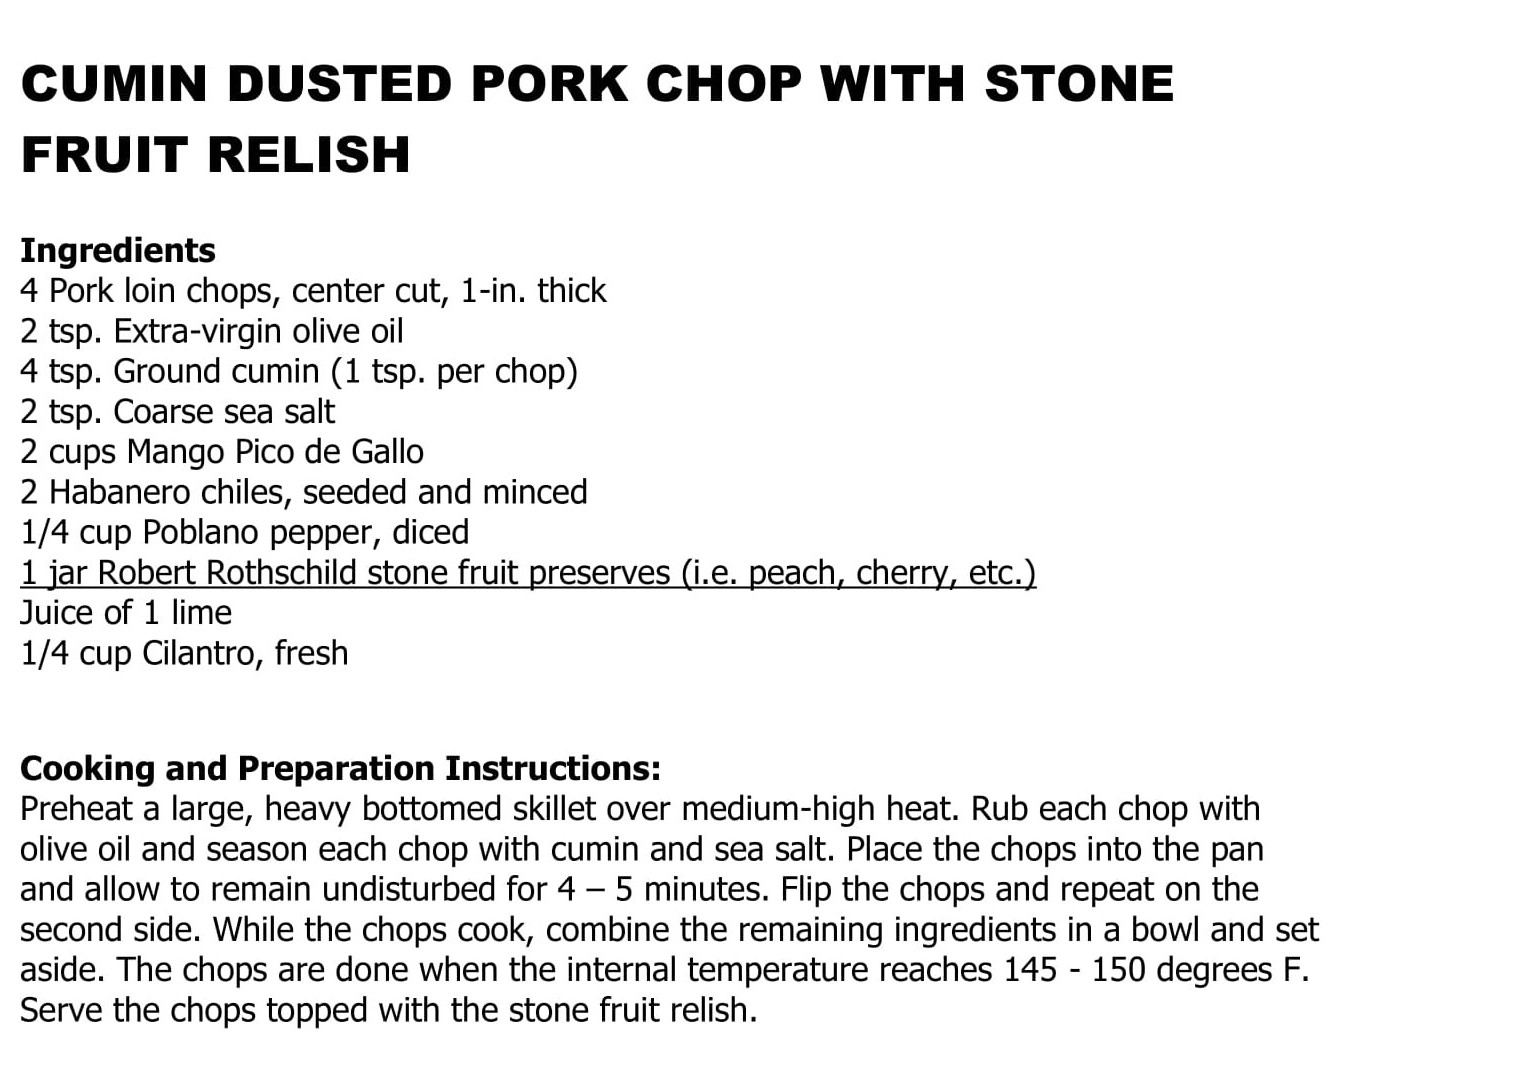 cumin-dusted-porkchops.jpg